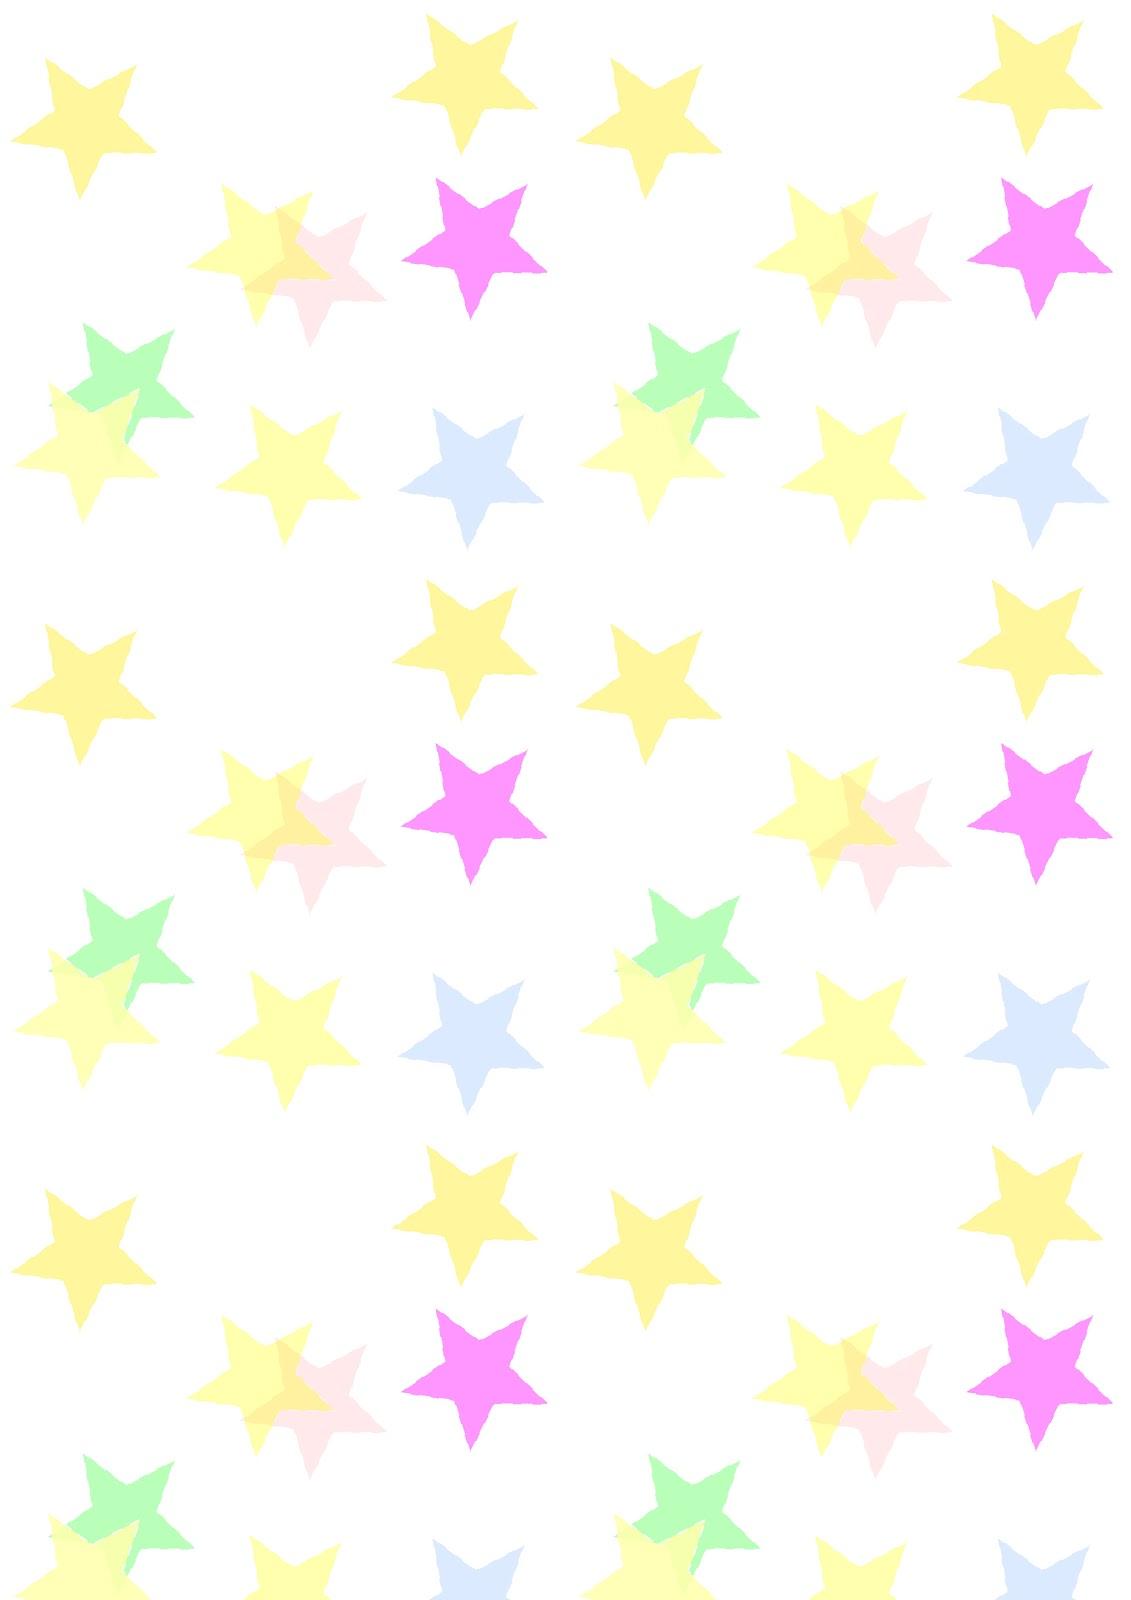 Free Digital Star Confetti Scrapbooking Paper